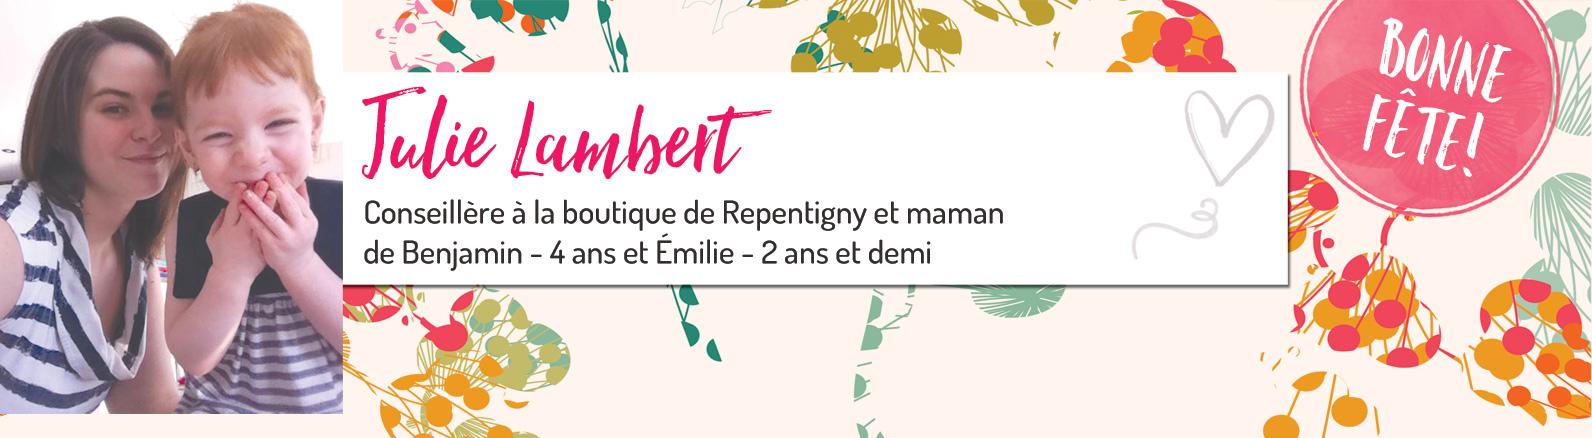 bf-julie_lambert-infolettre